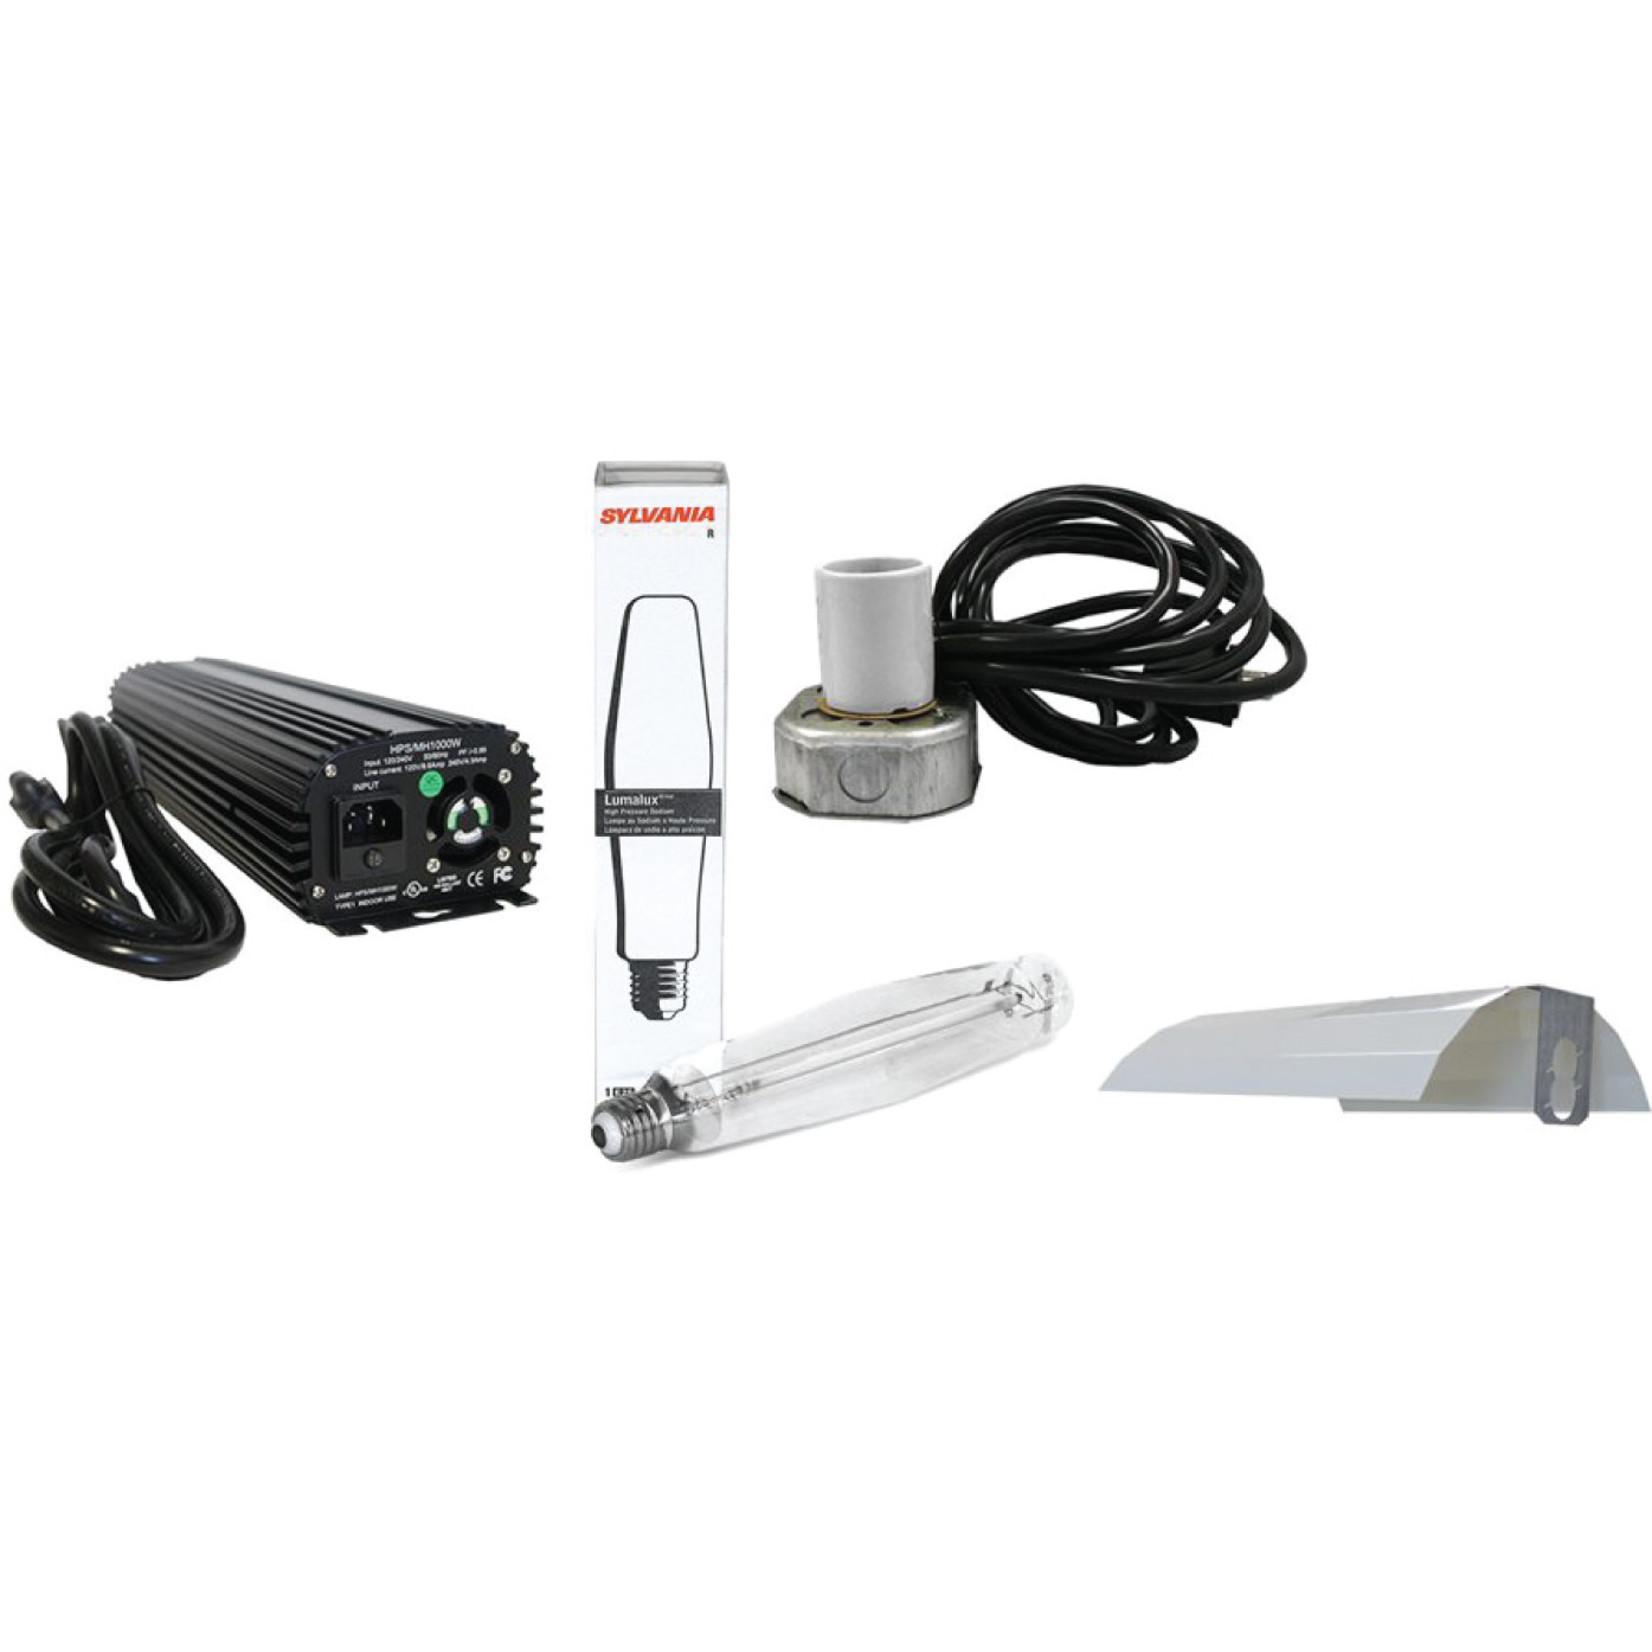 1000W E-Ballast Kit